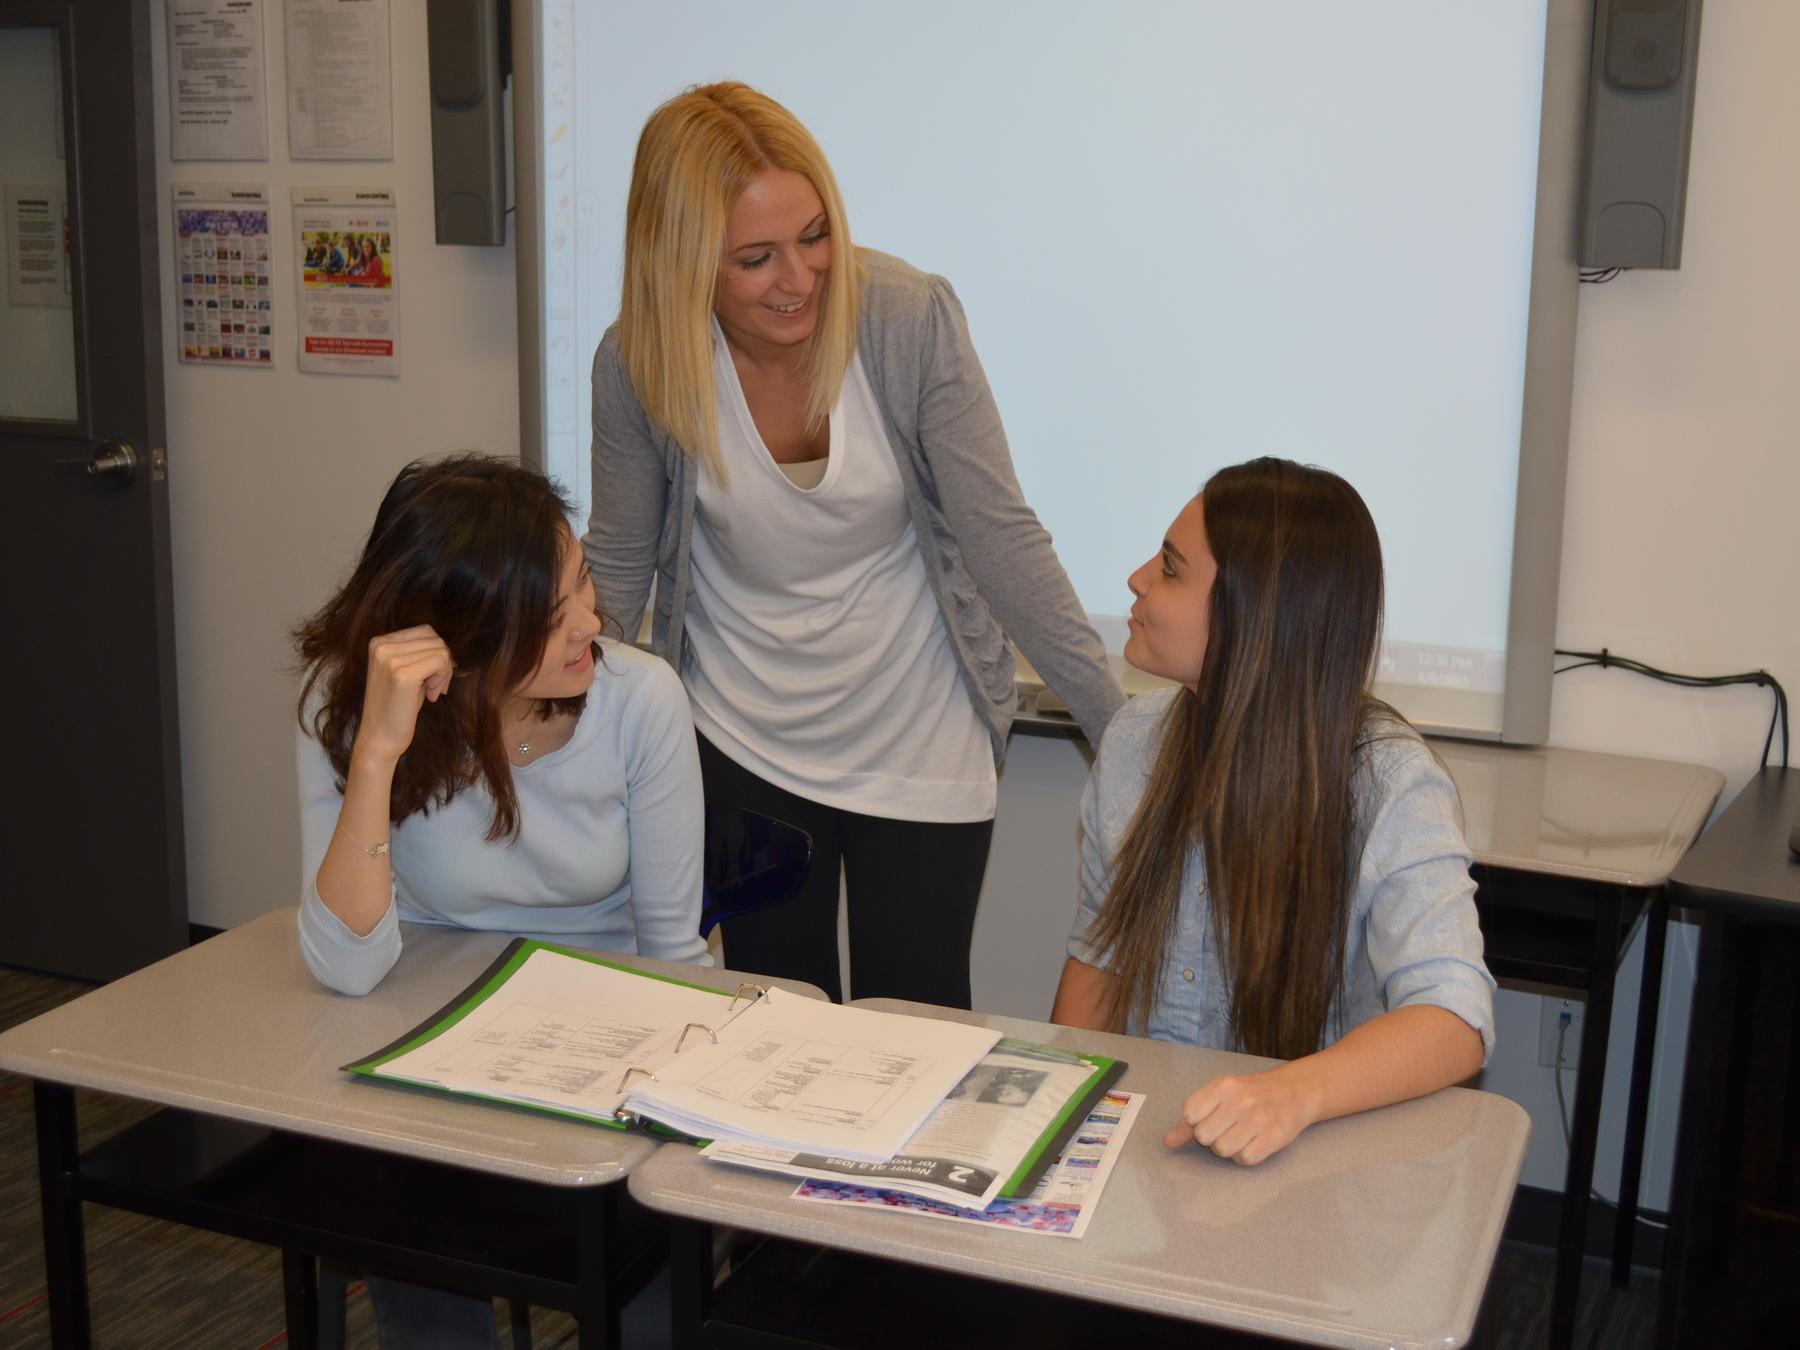 vancouver_school_classroom_04